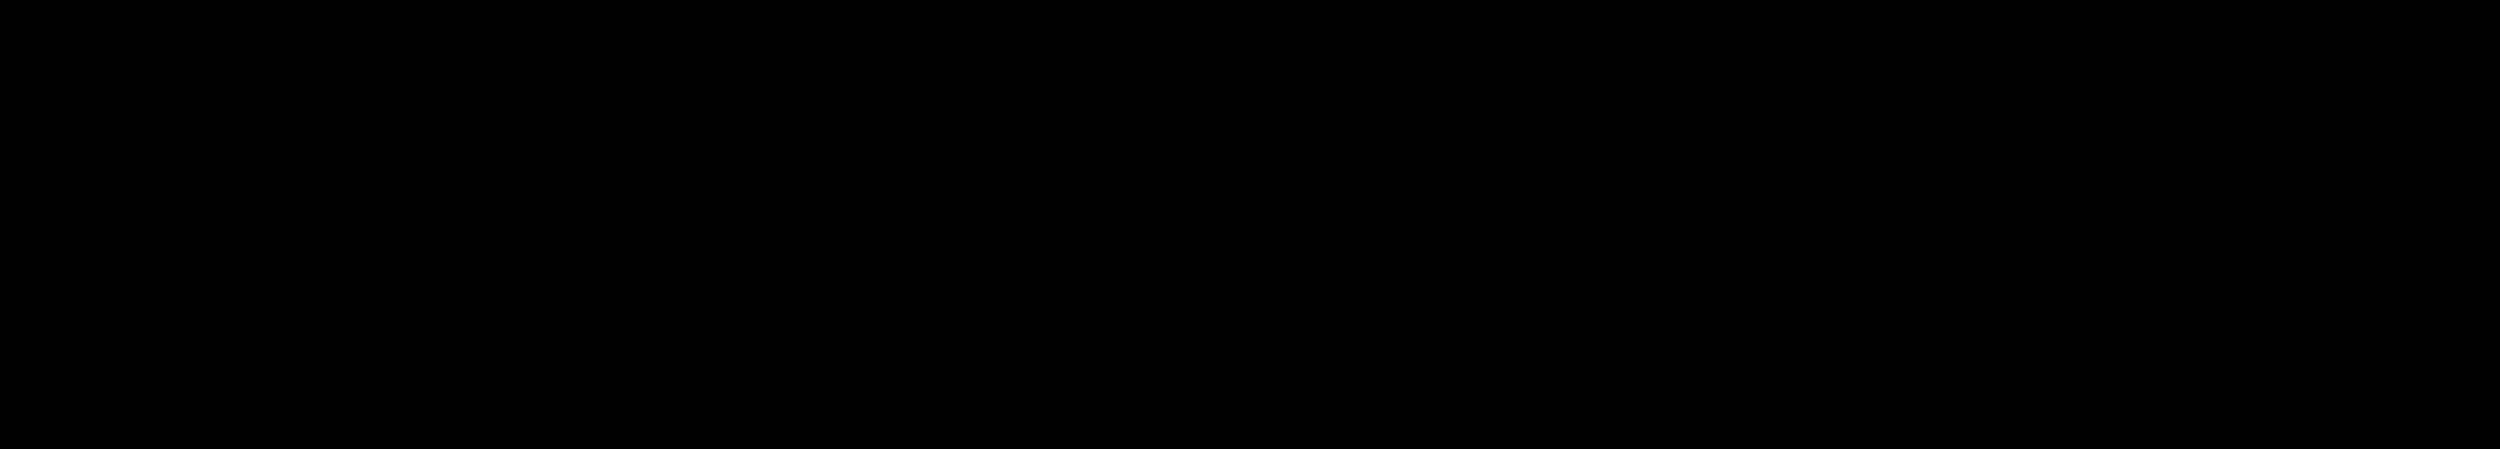 NanoASR_RGB_black_transparent.png